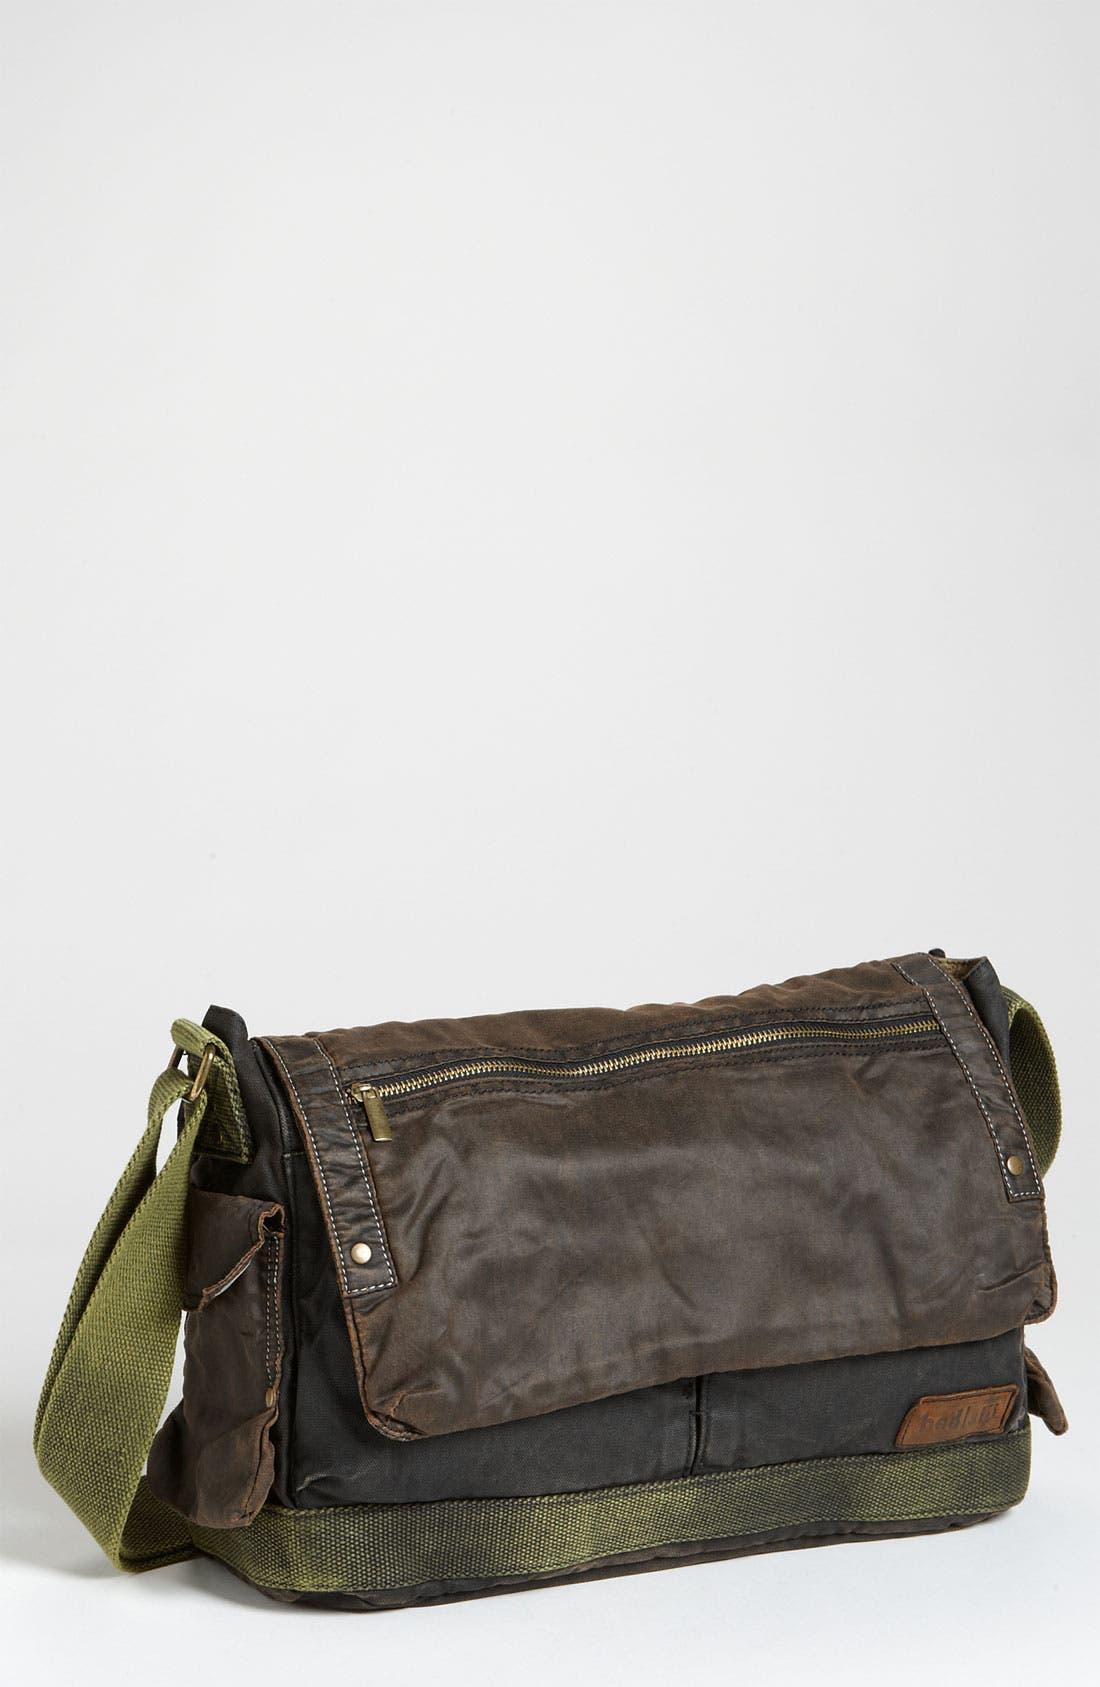 Alternate Image 1 Selected - Bed Stu 'Hawkeye' Messenger Bag